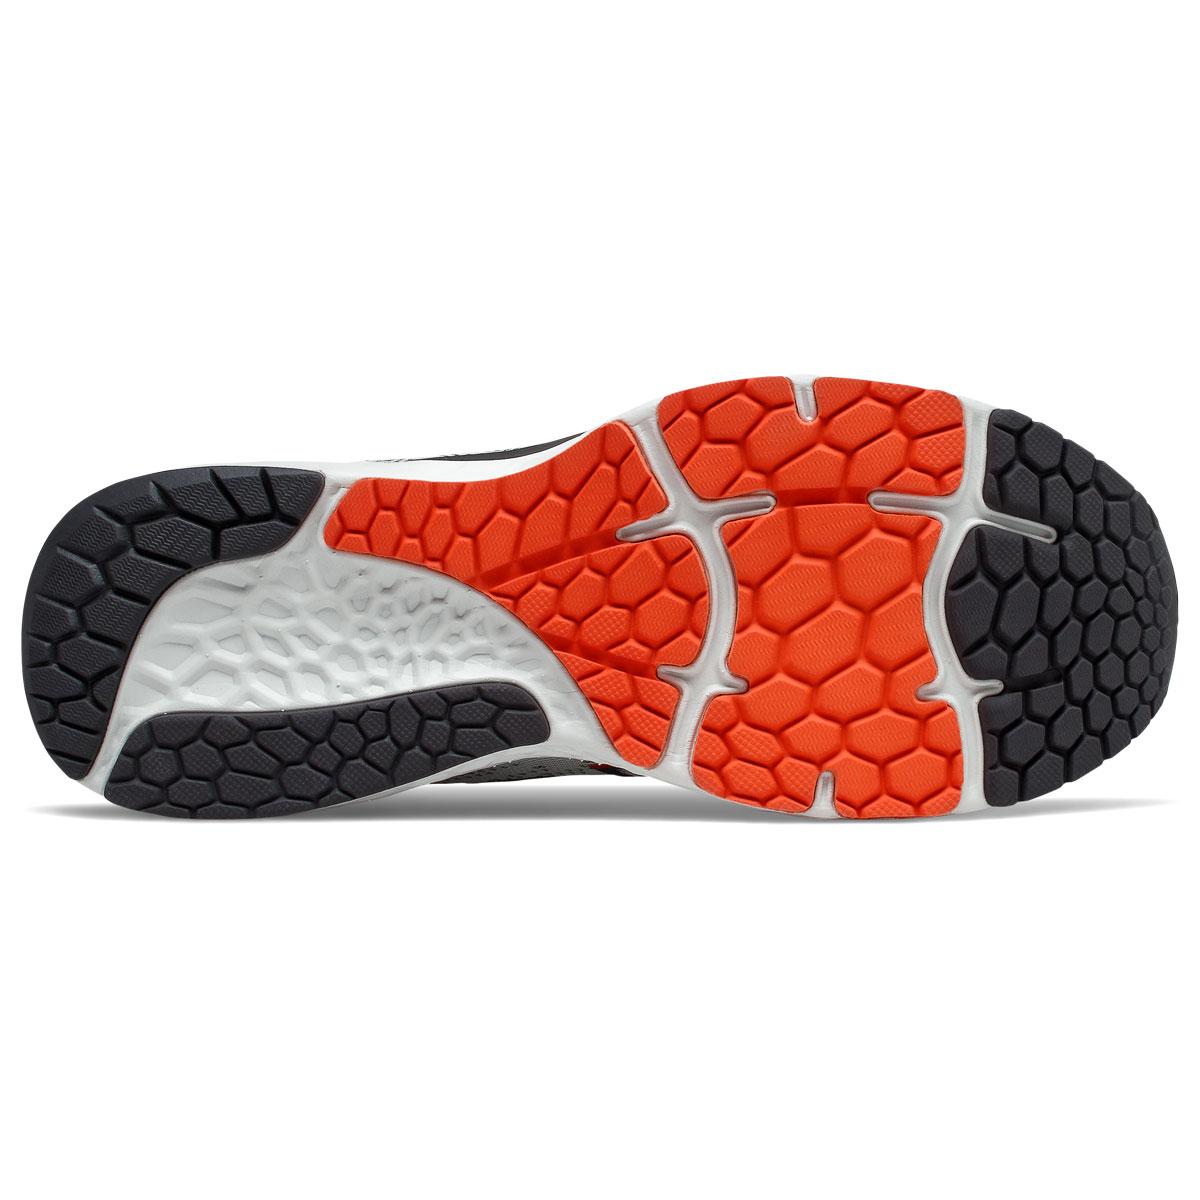 Men's New Balance Fresh Foam 880v11 Running Shoe - Color: Arrowroot/Ghost Pepper - Size: 7 - Width: Wide, Arrowroot/Ghost Pepper, large, image 4